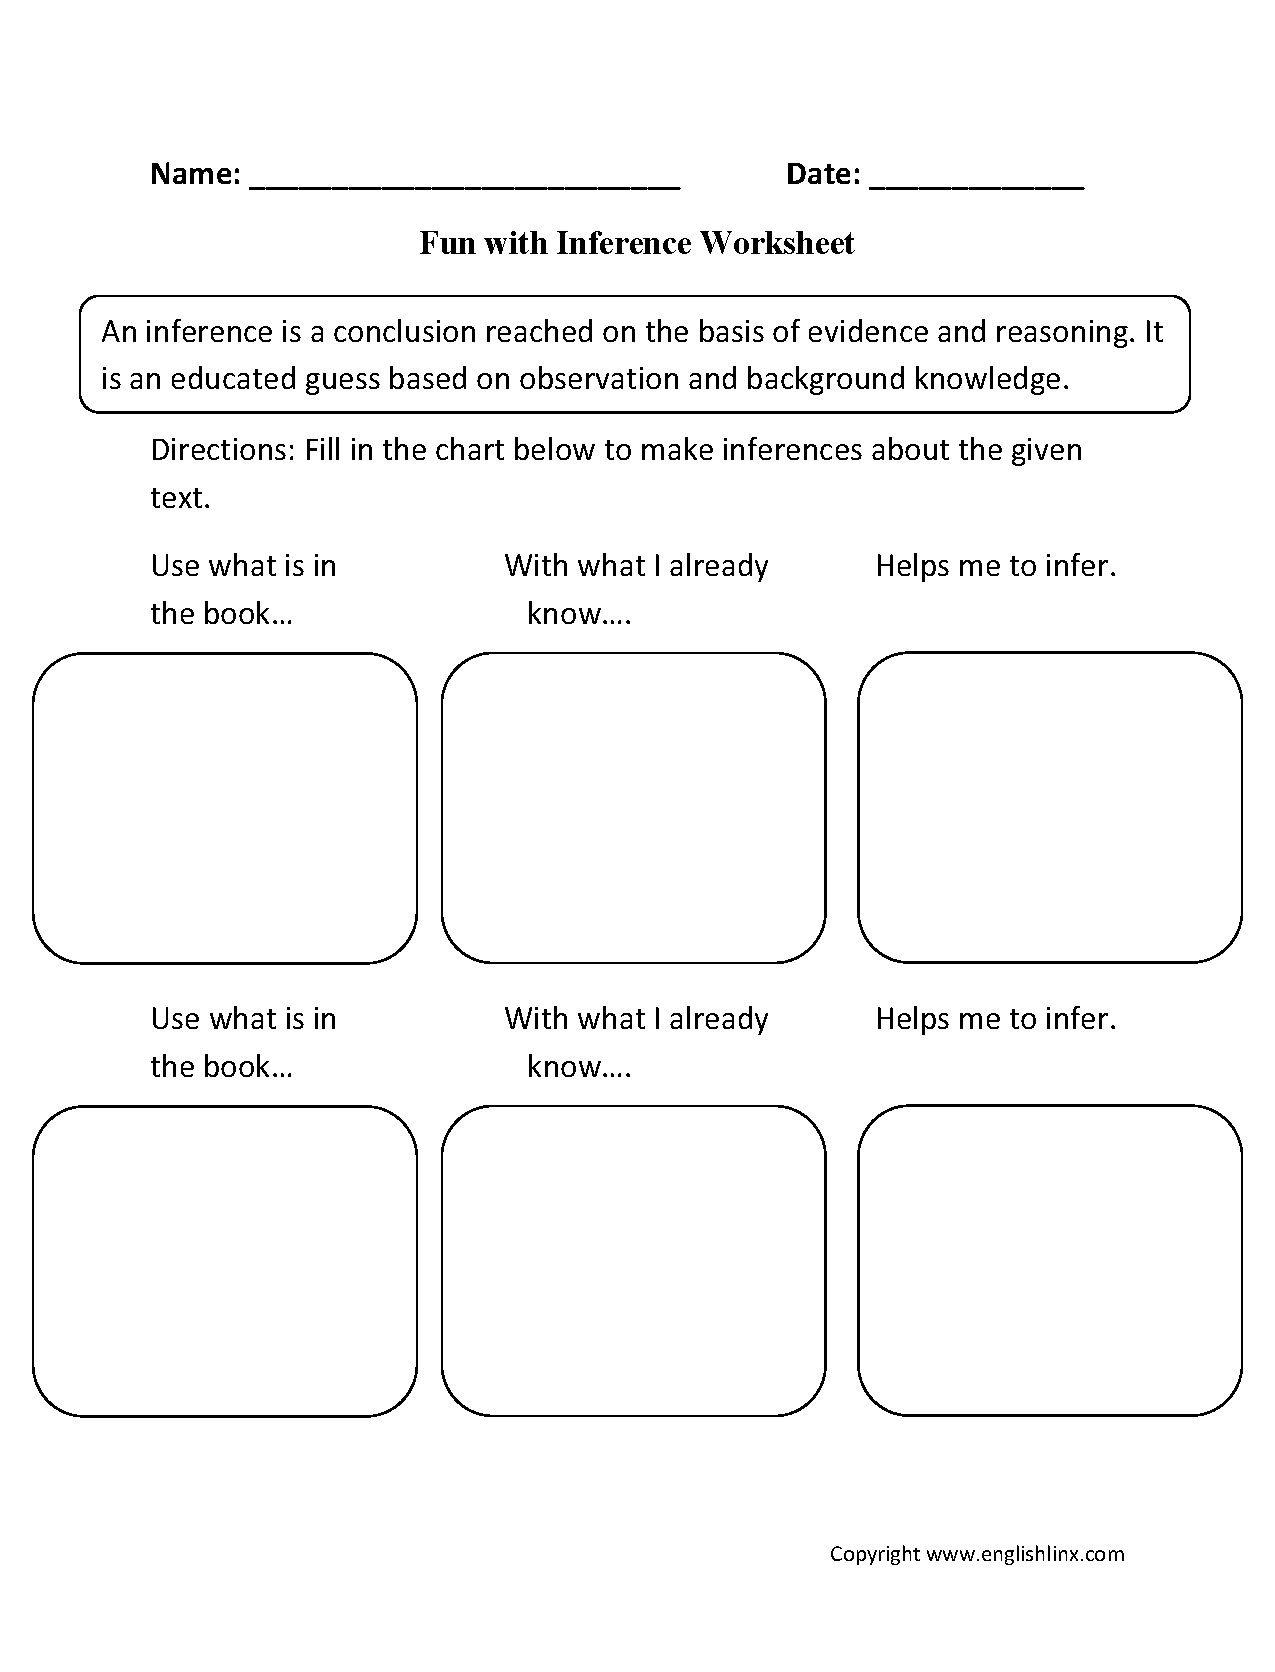 7 Action Verb Worksheets 3rd Grade In